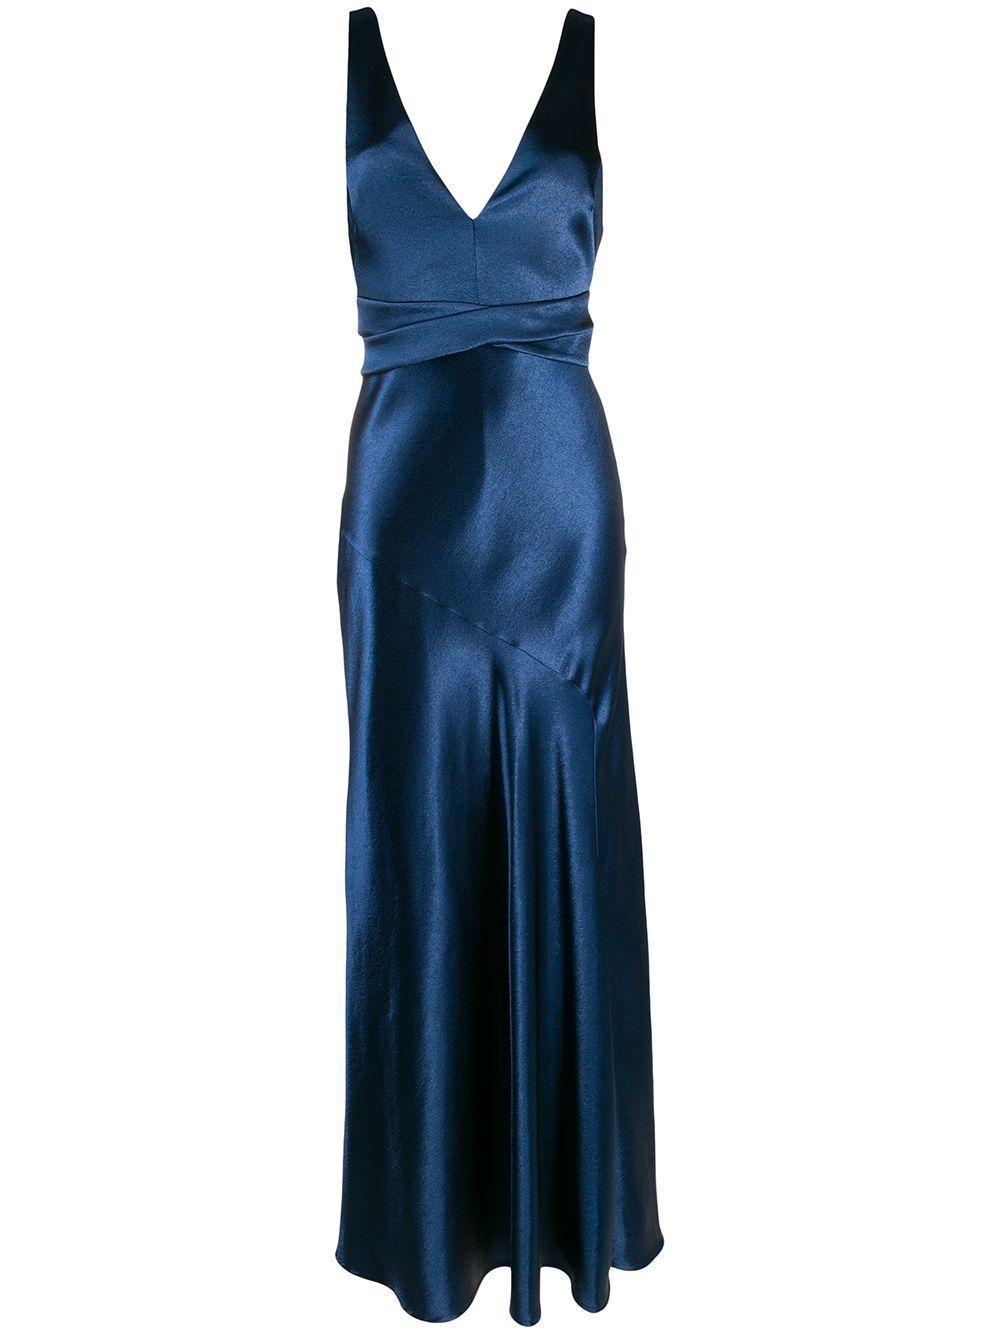 Metallic Bella Dress Item # 1868